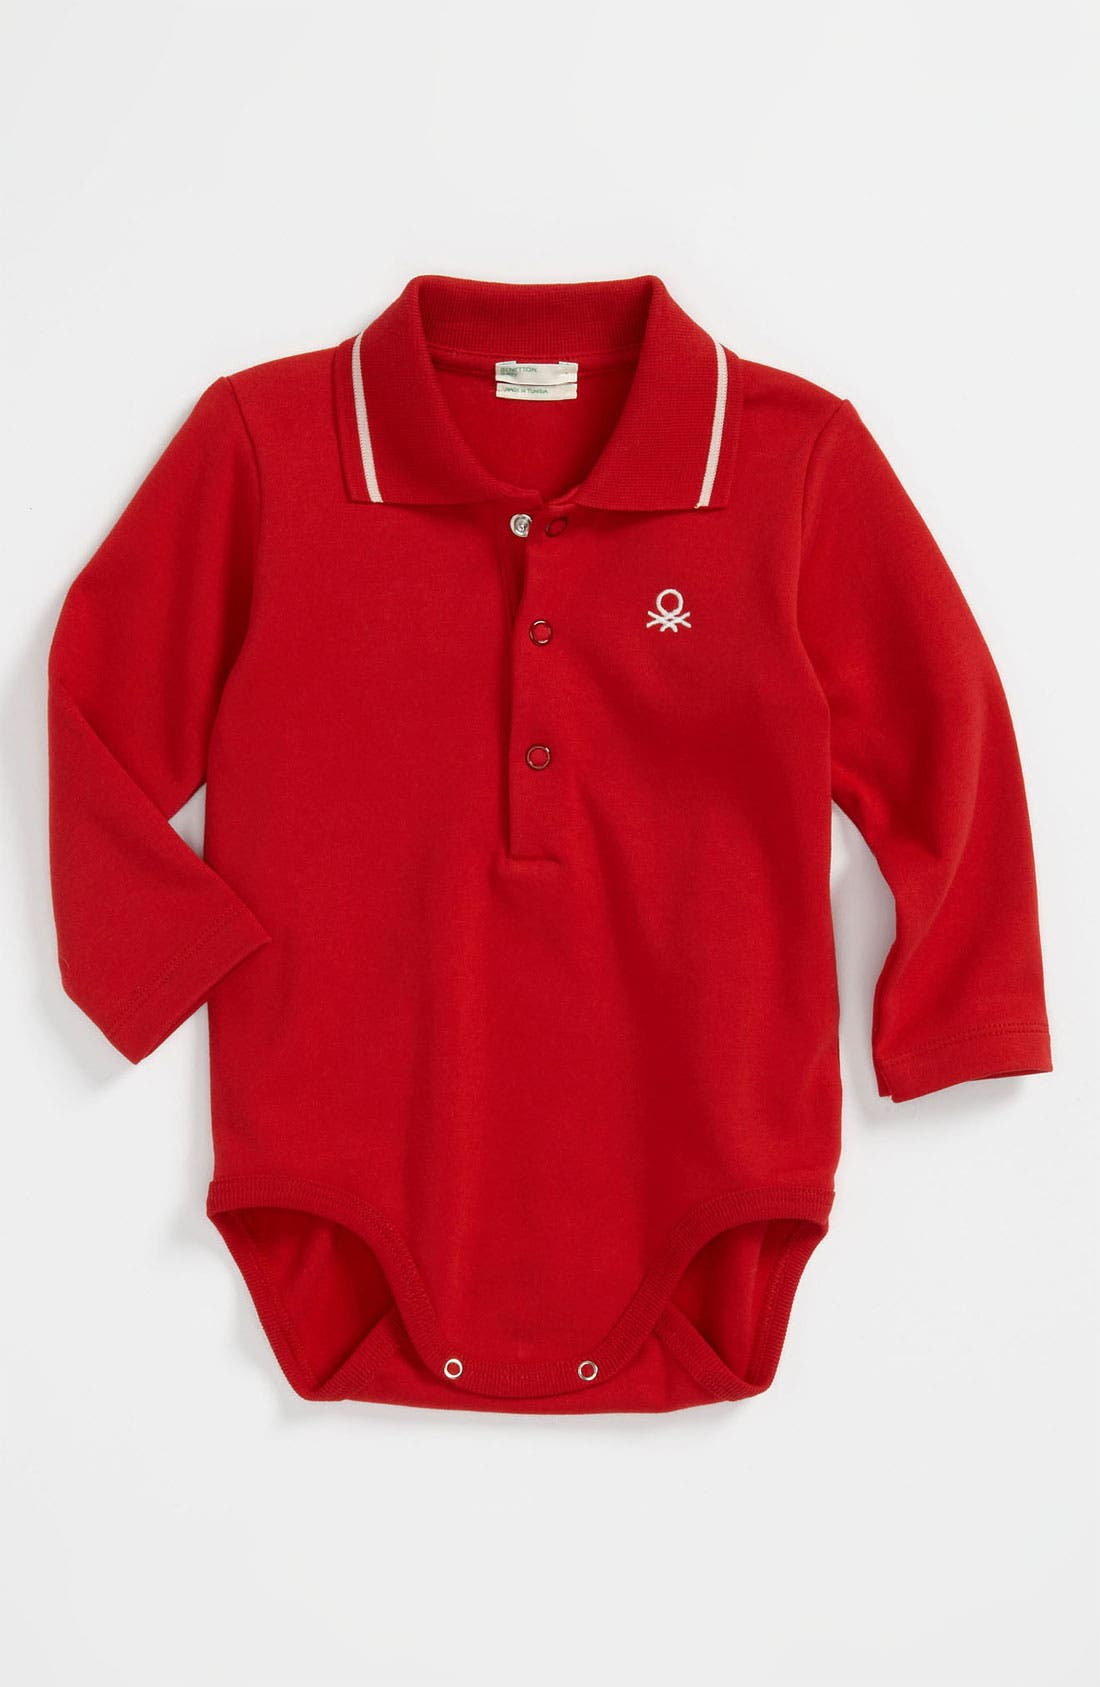 Main Image - United Colors of Benetton Kids Polo Bodysuit (Infant)